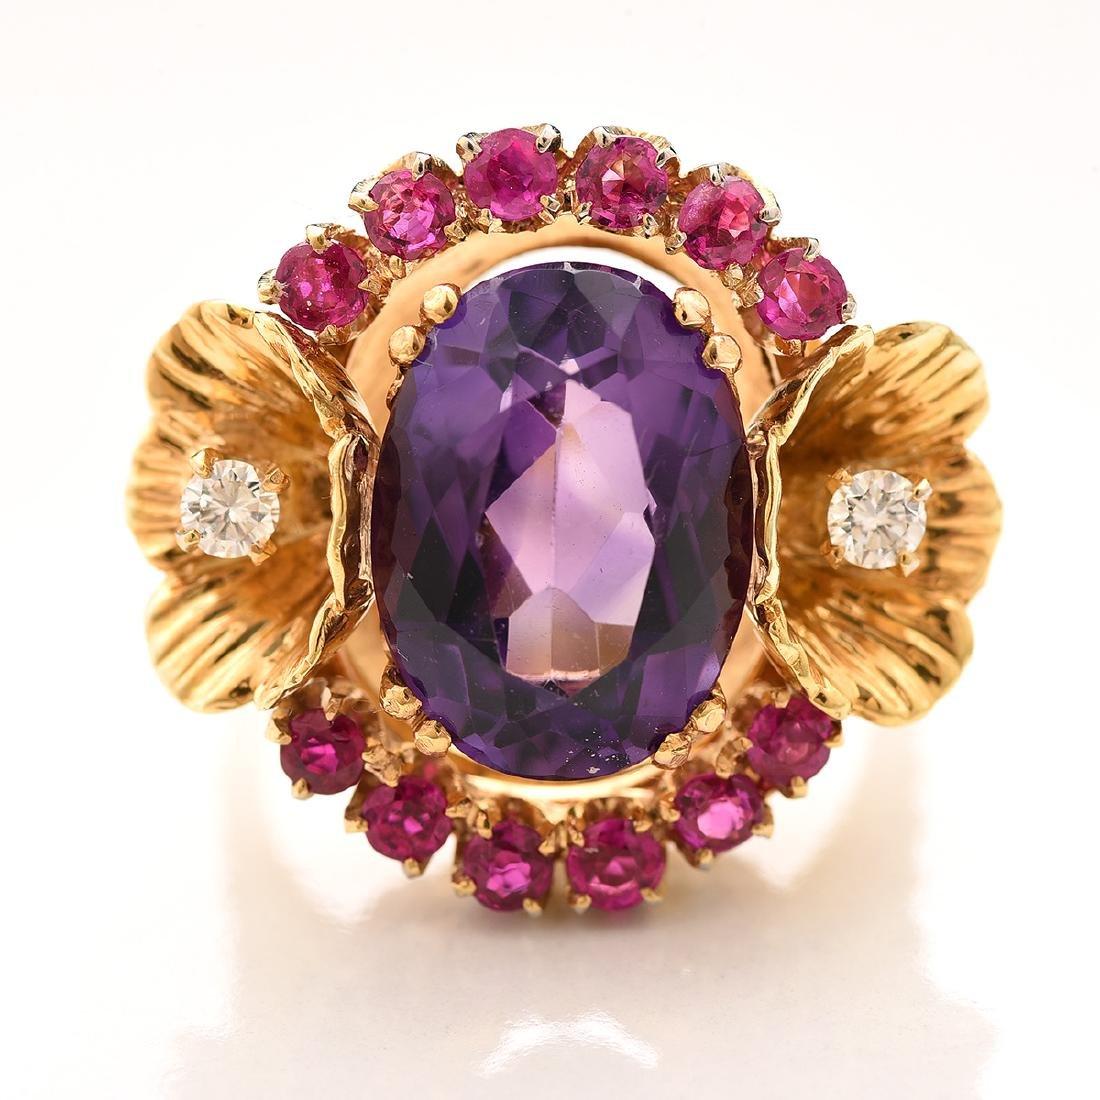 Amethyst, Ruby, Diamond, 14k Ring. - 2